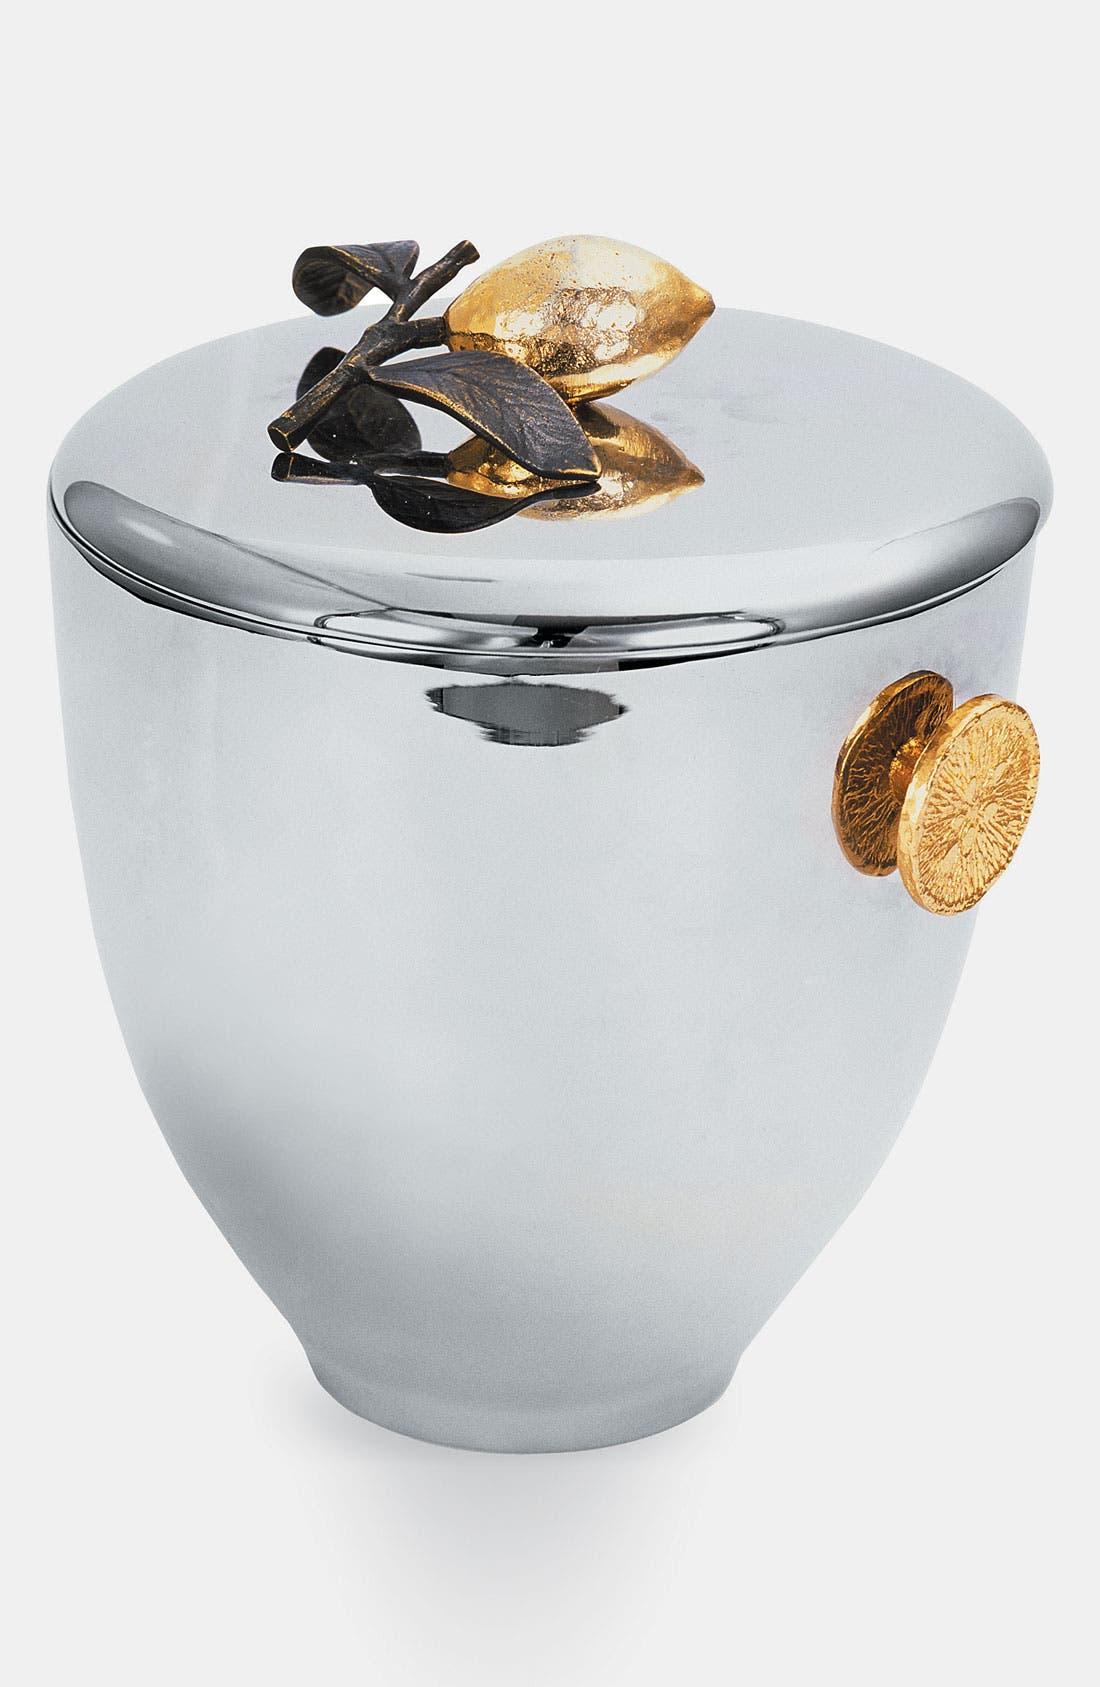 Alternate Image 1 Selected - Michael Aram 'Lemonwood' Ice Bucket